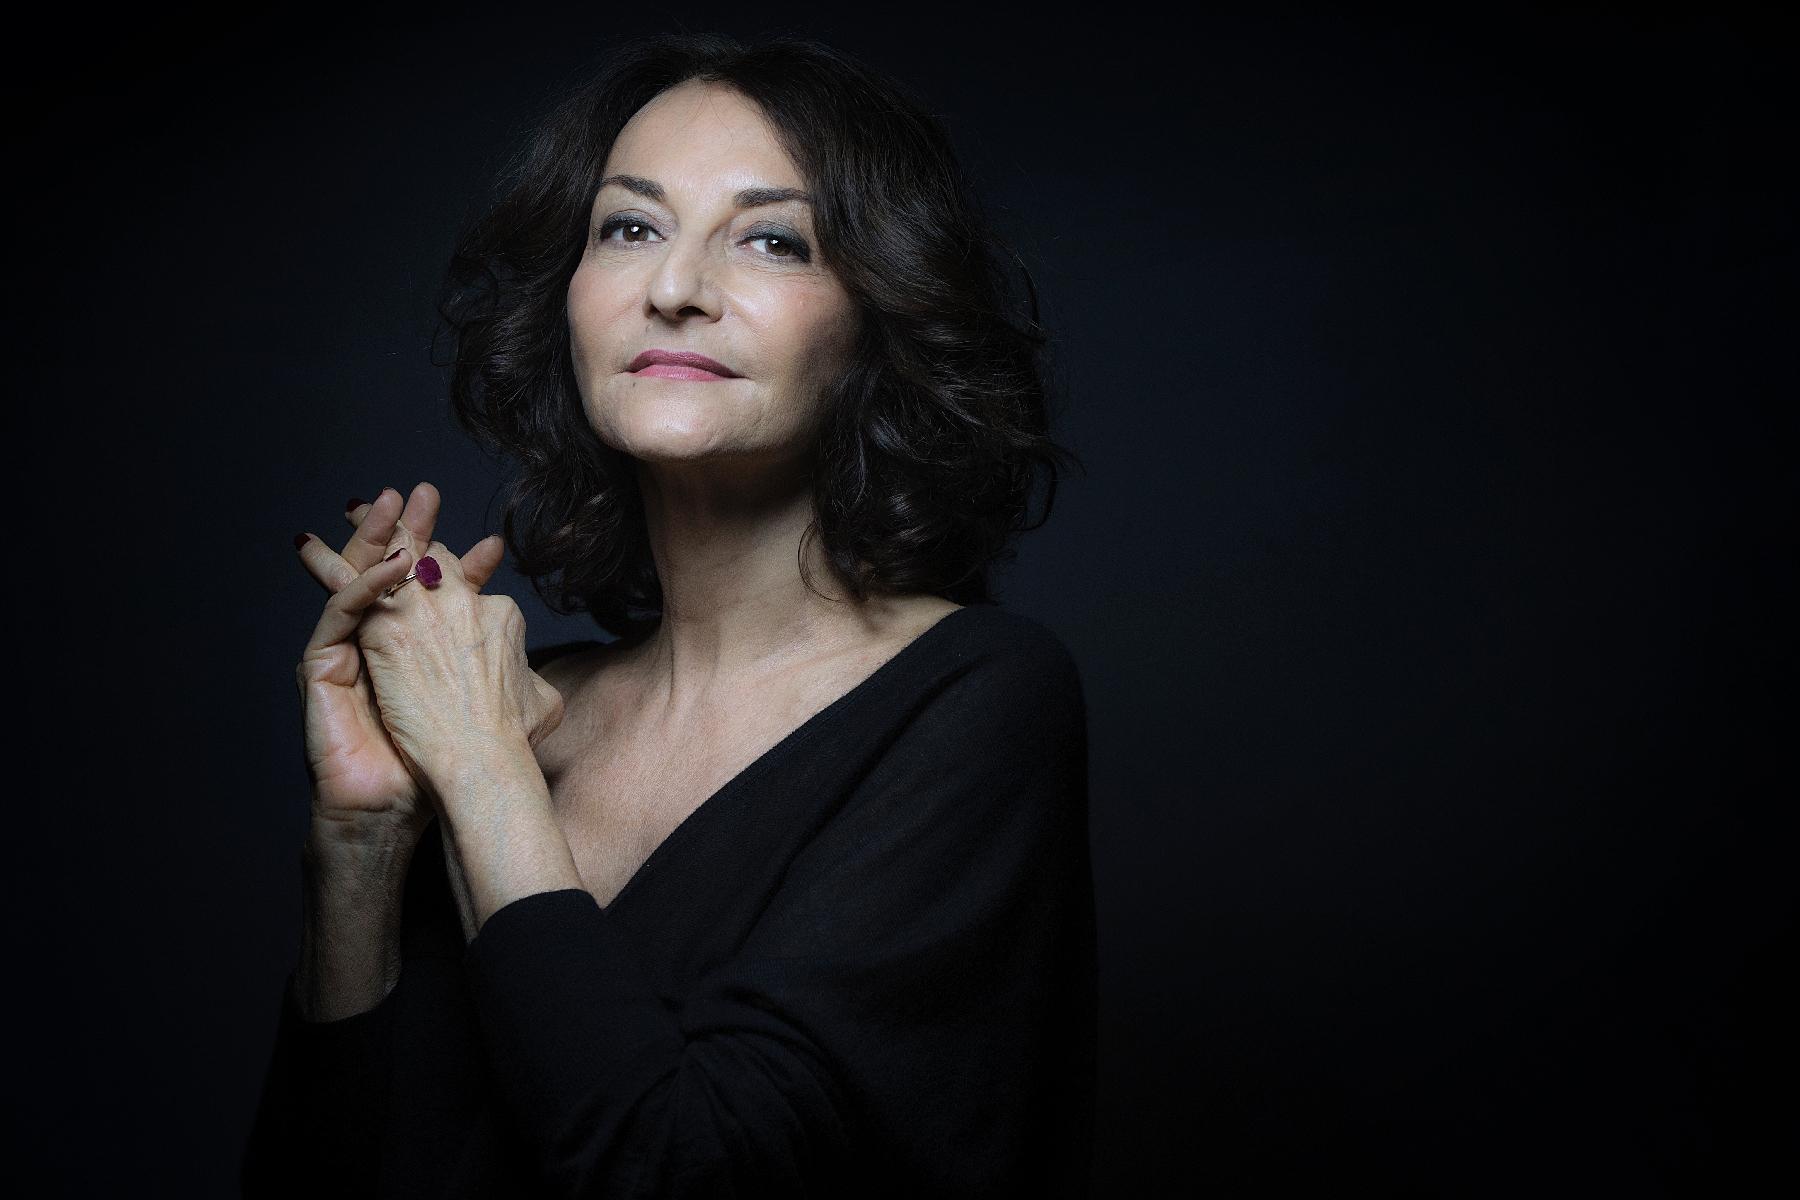 Nathalie Rykiel